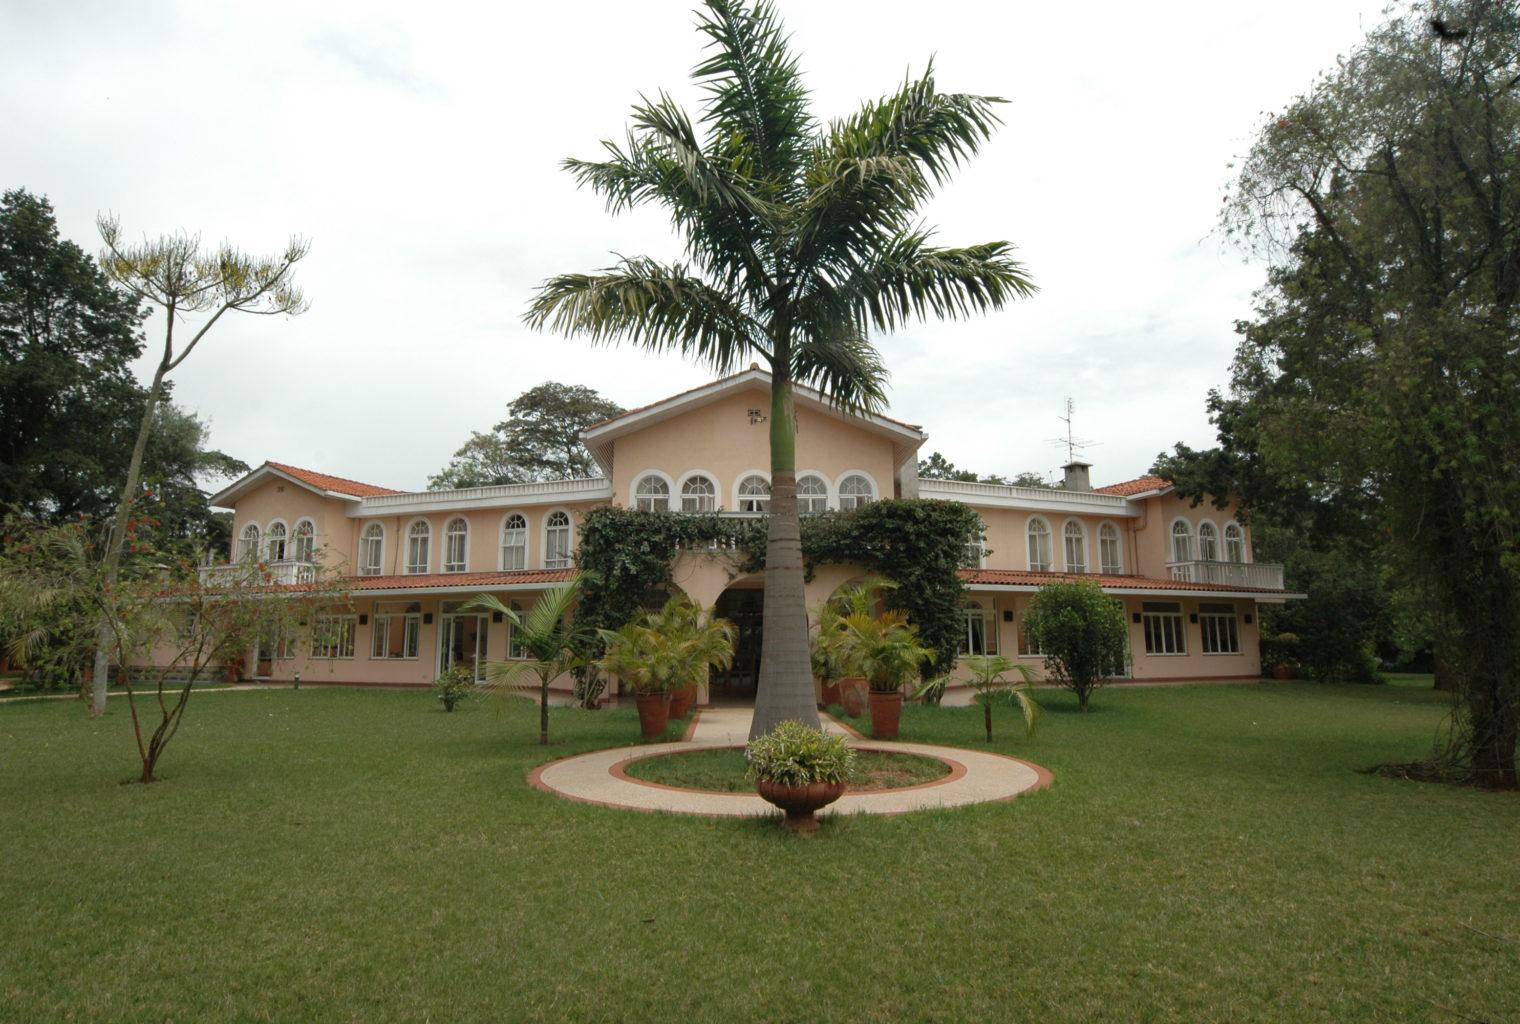 House of Waine Kenya Exterior